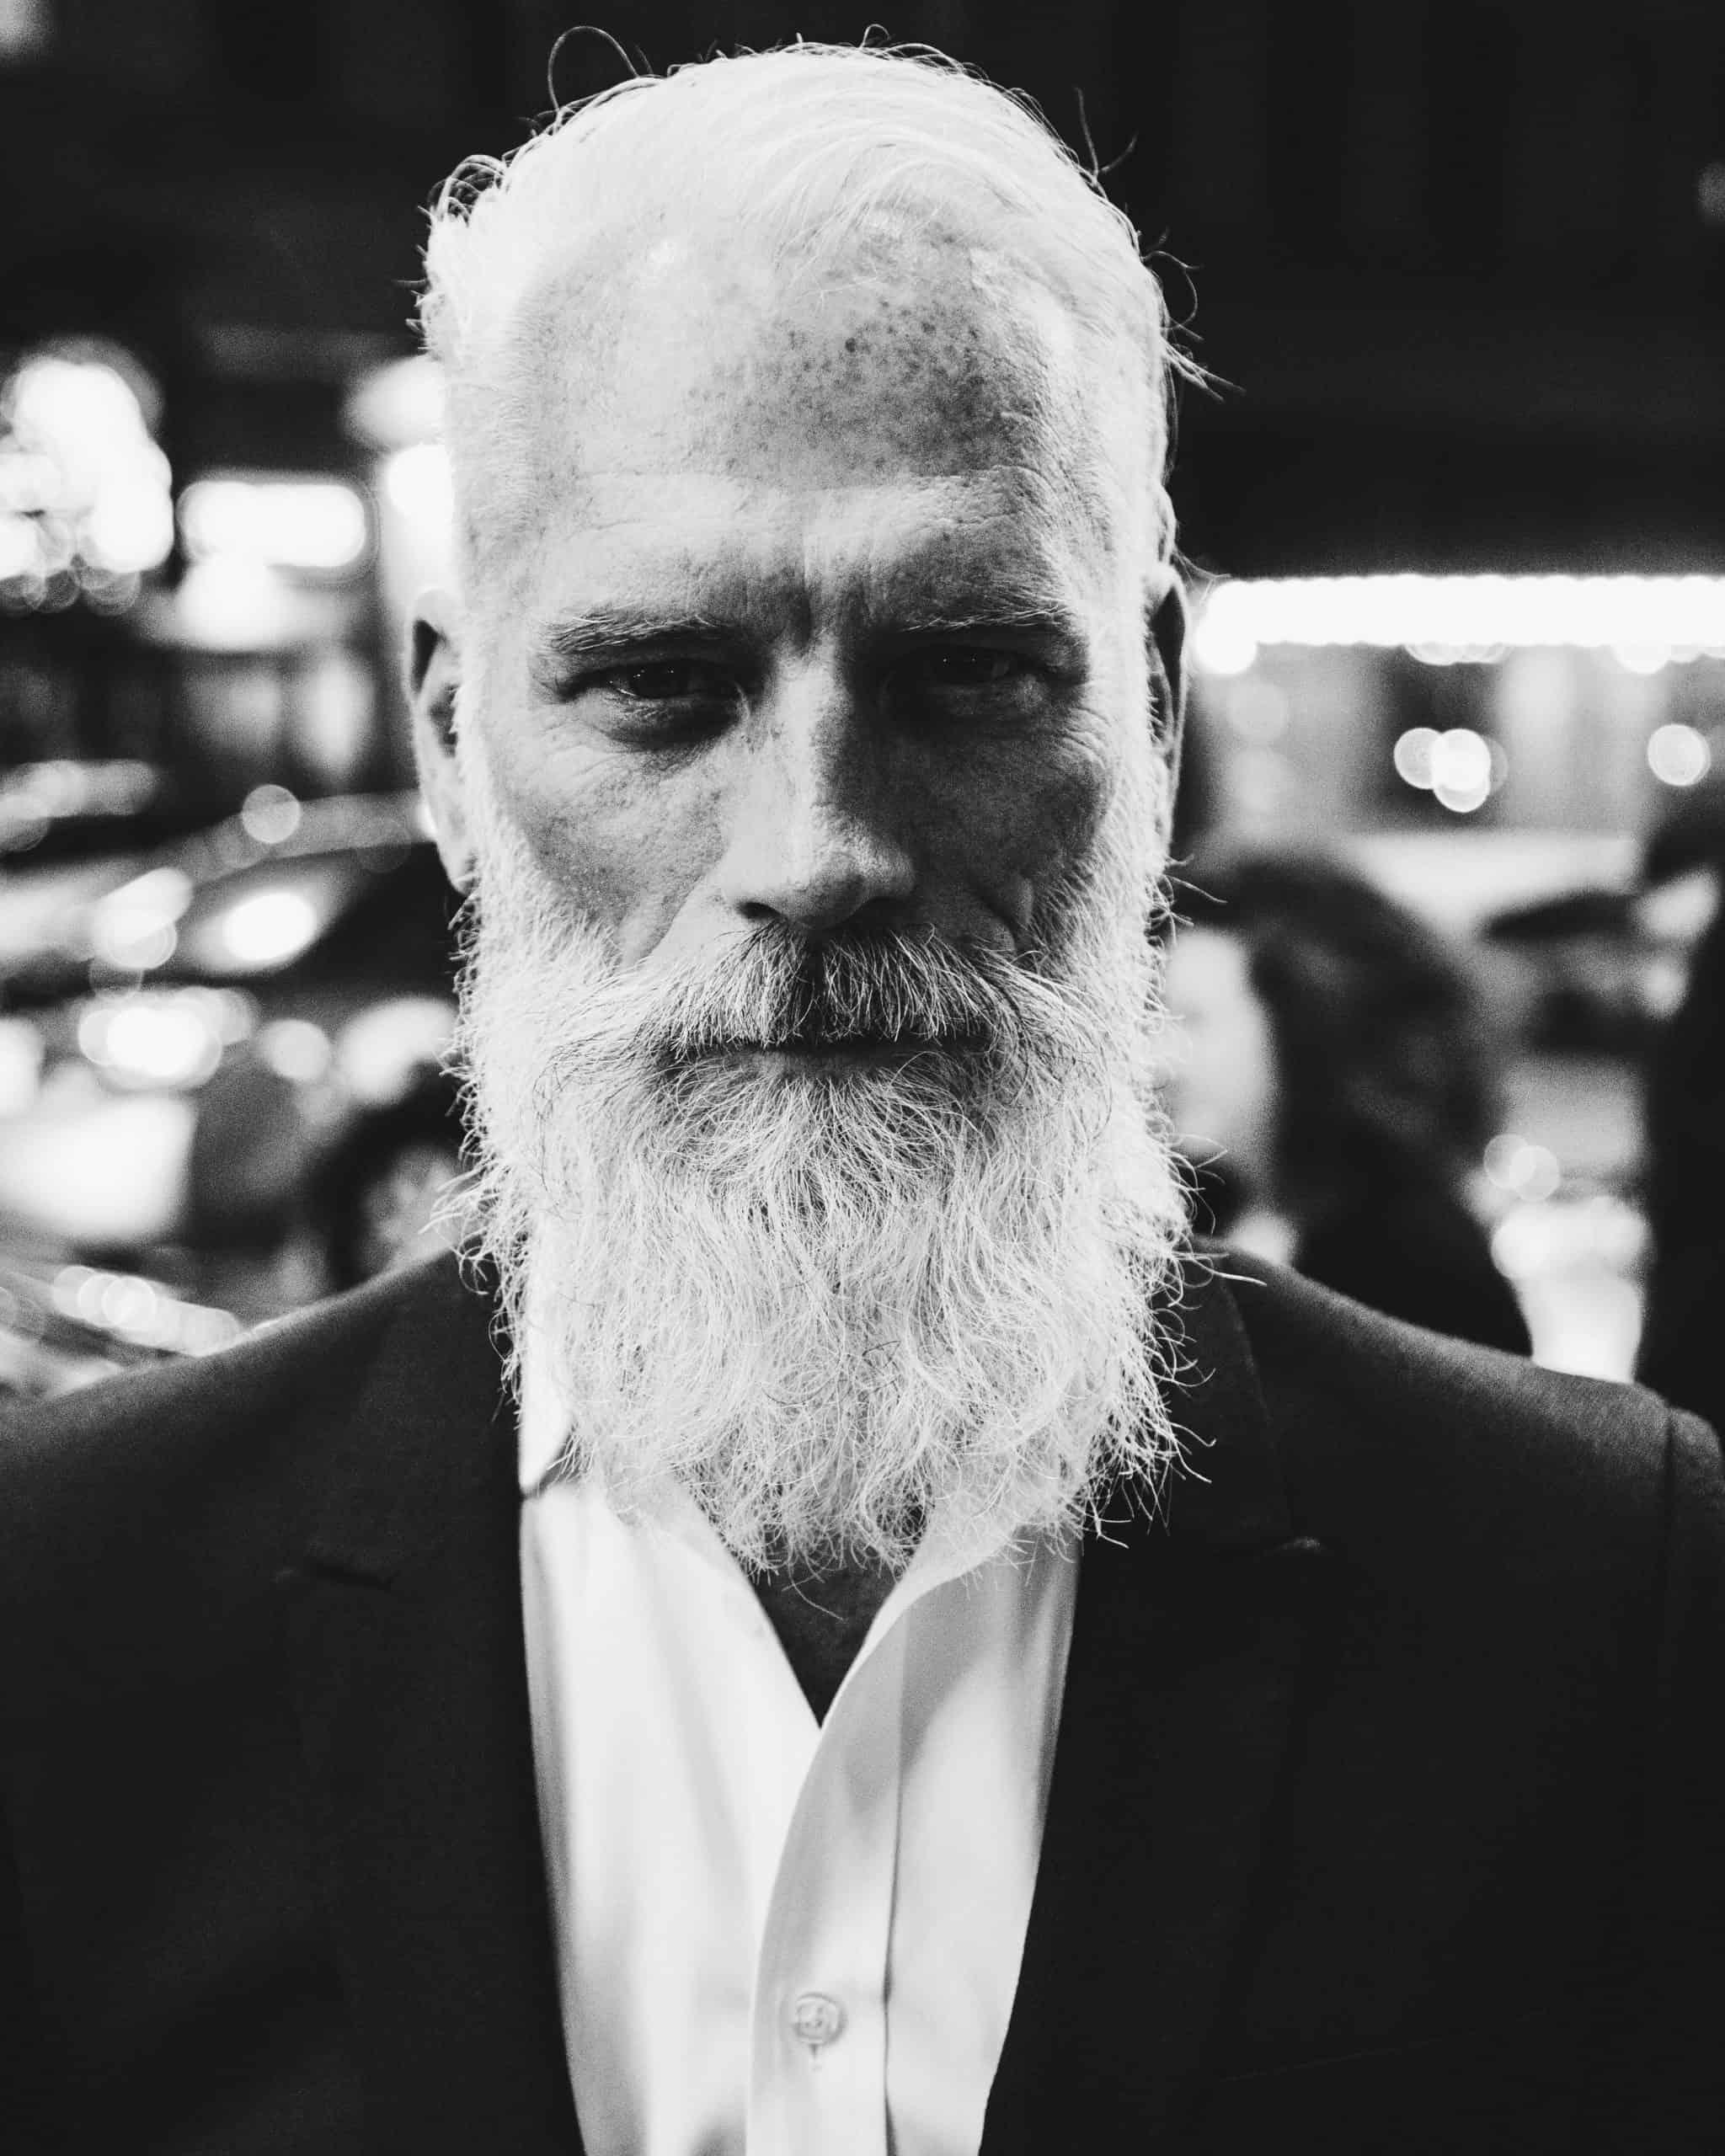 Beard growing pro - old man's beard